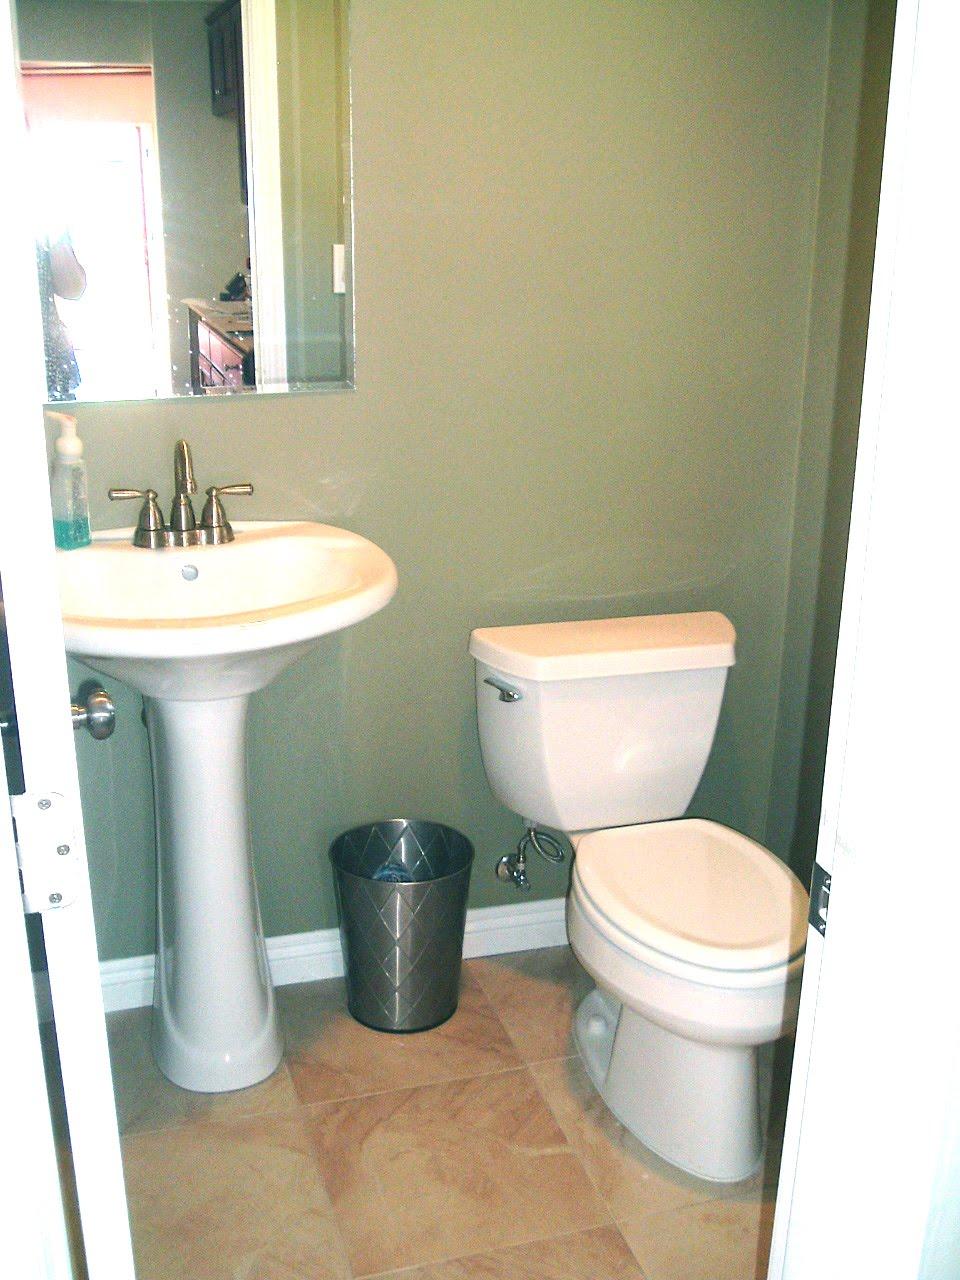 Massasoit House Laundry Room And Half Bath